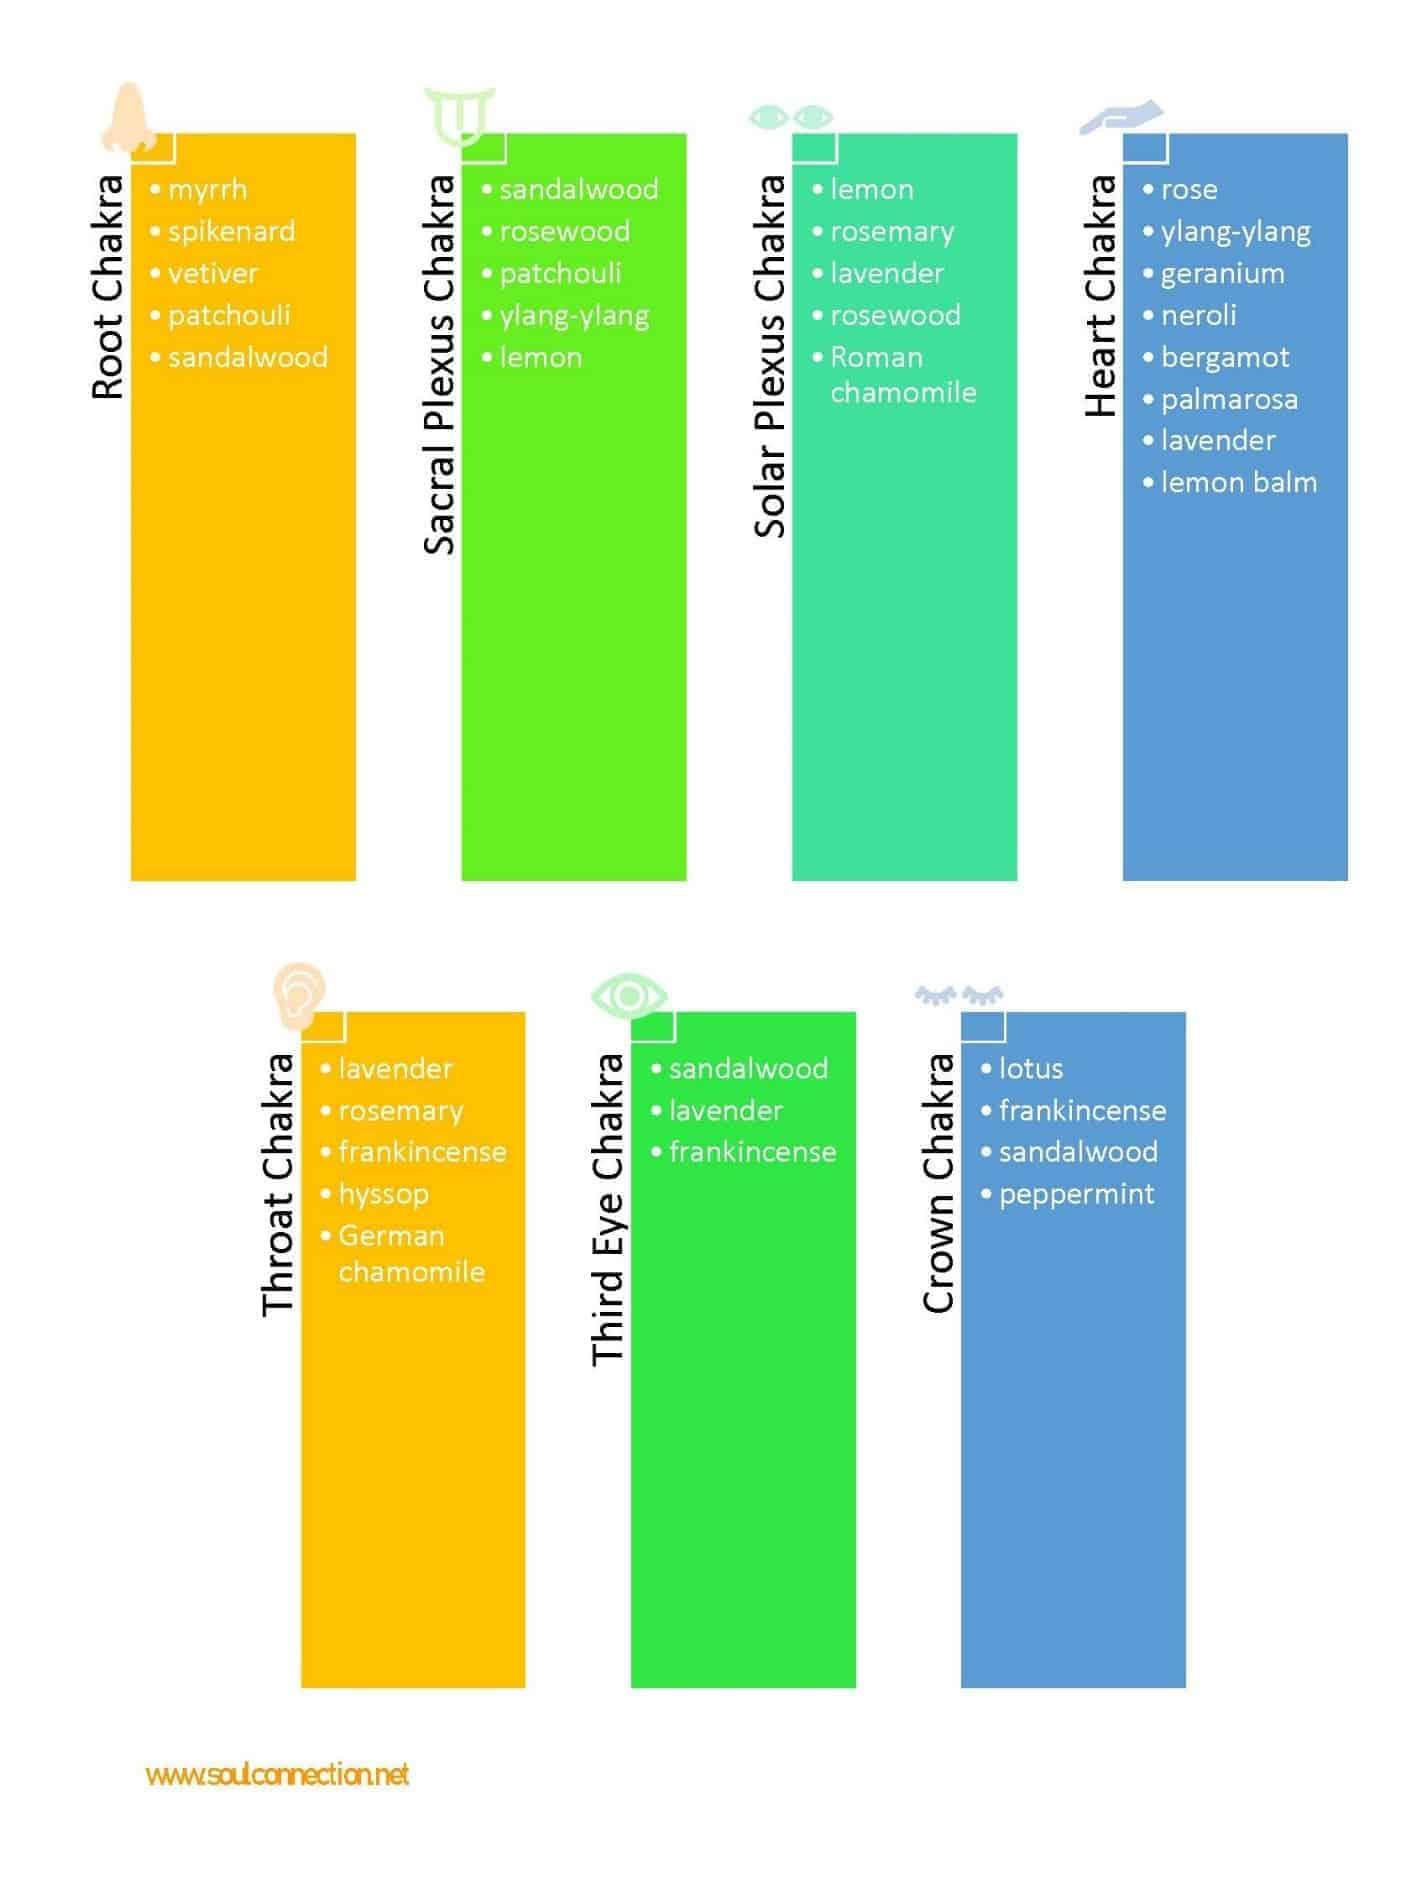 essential oil healing chart